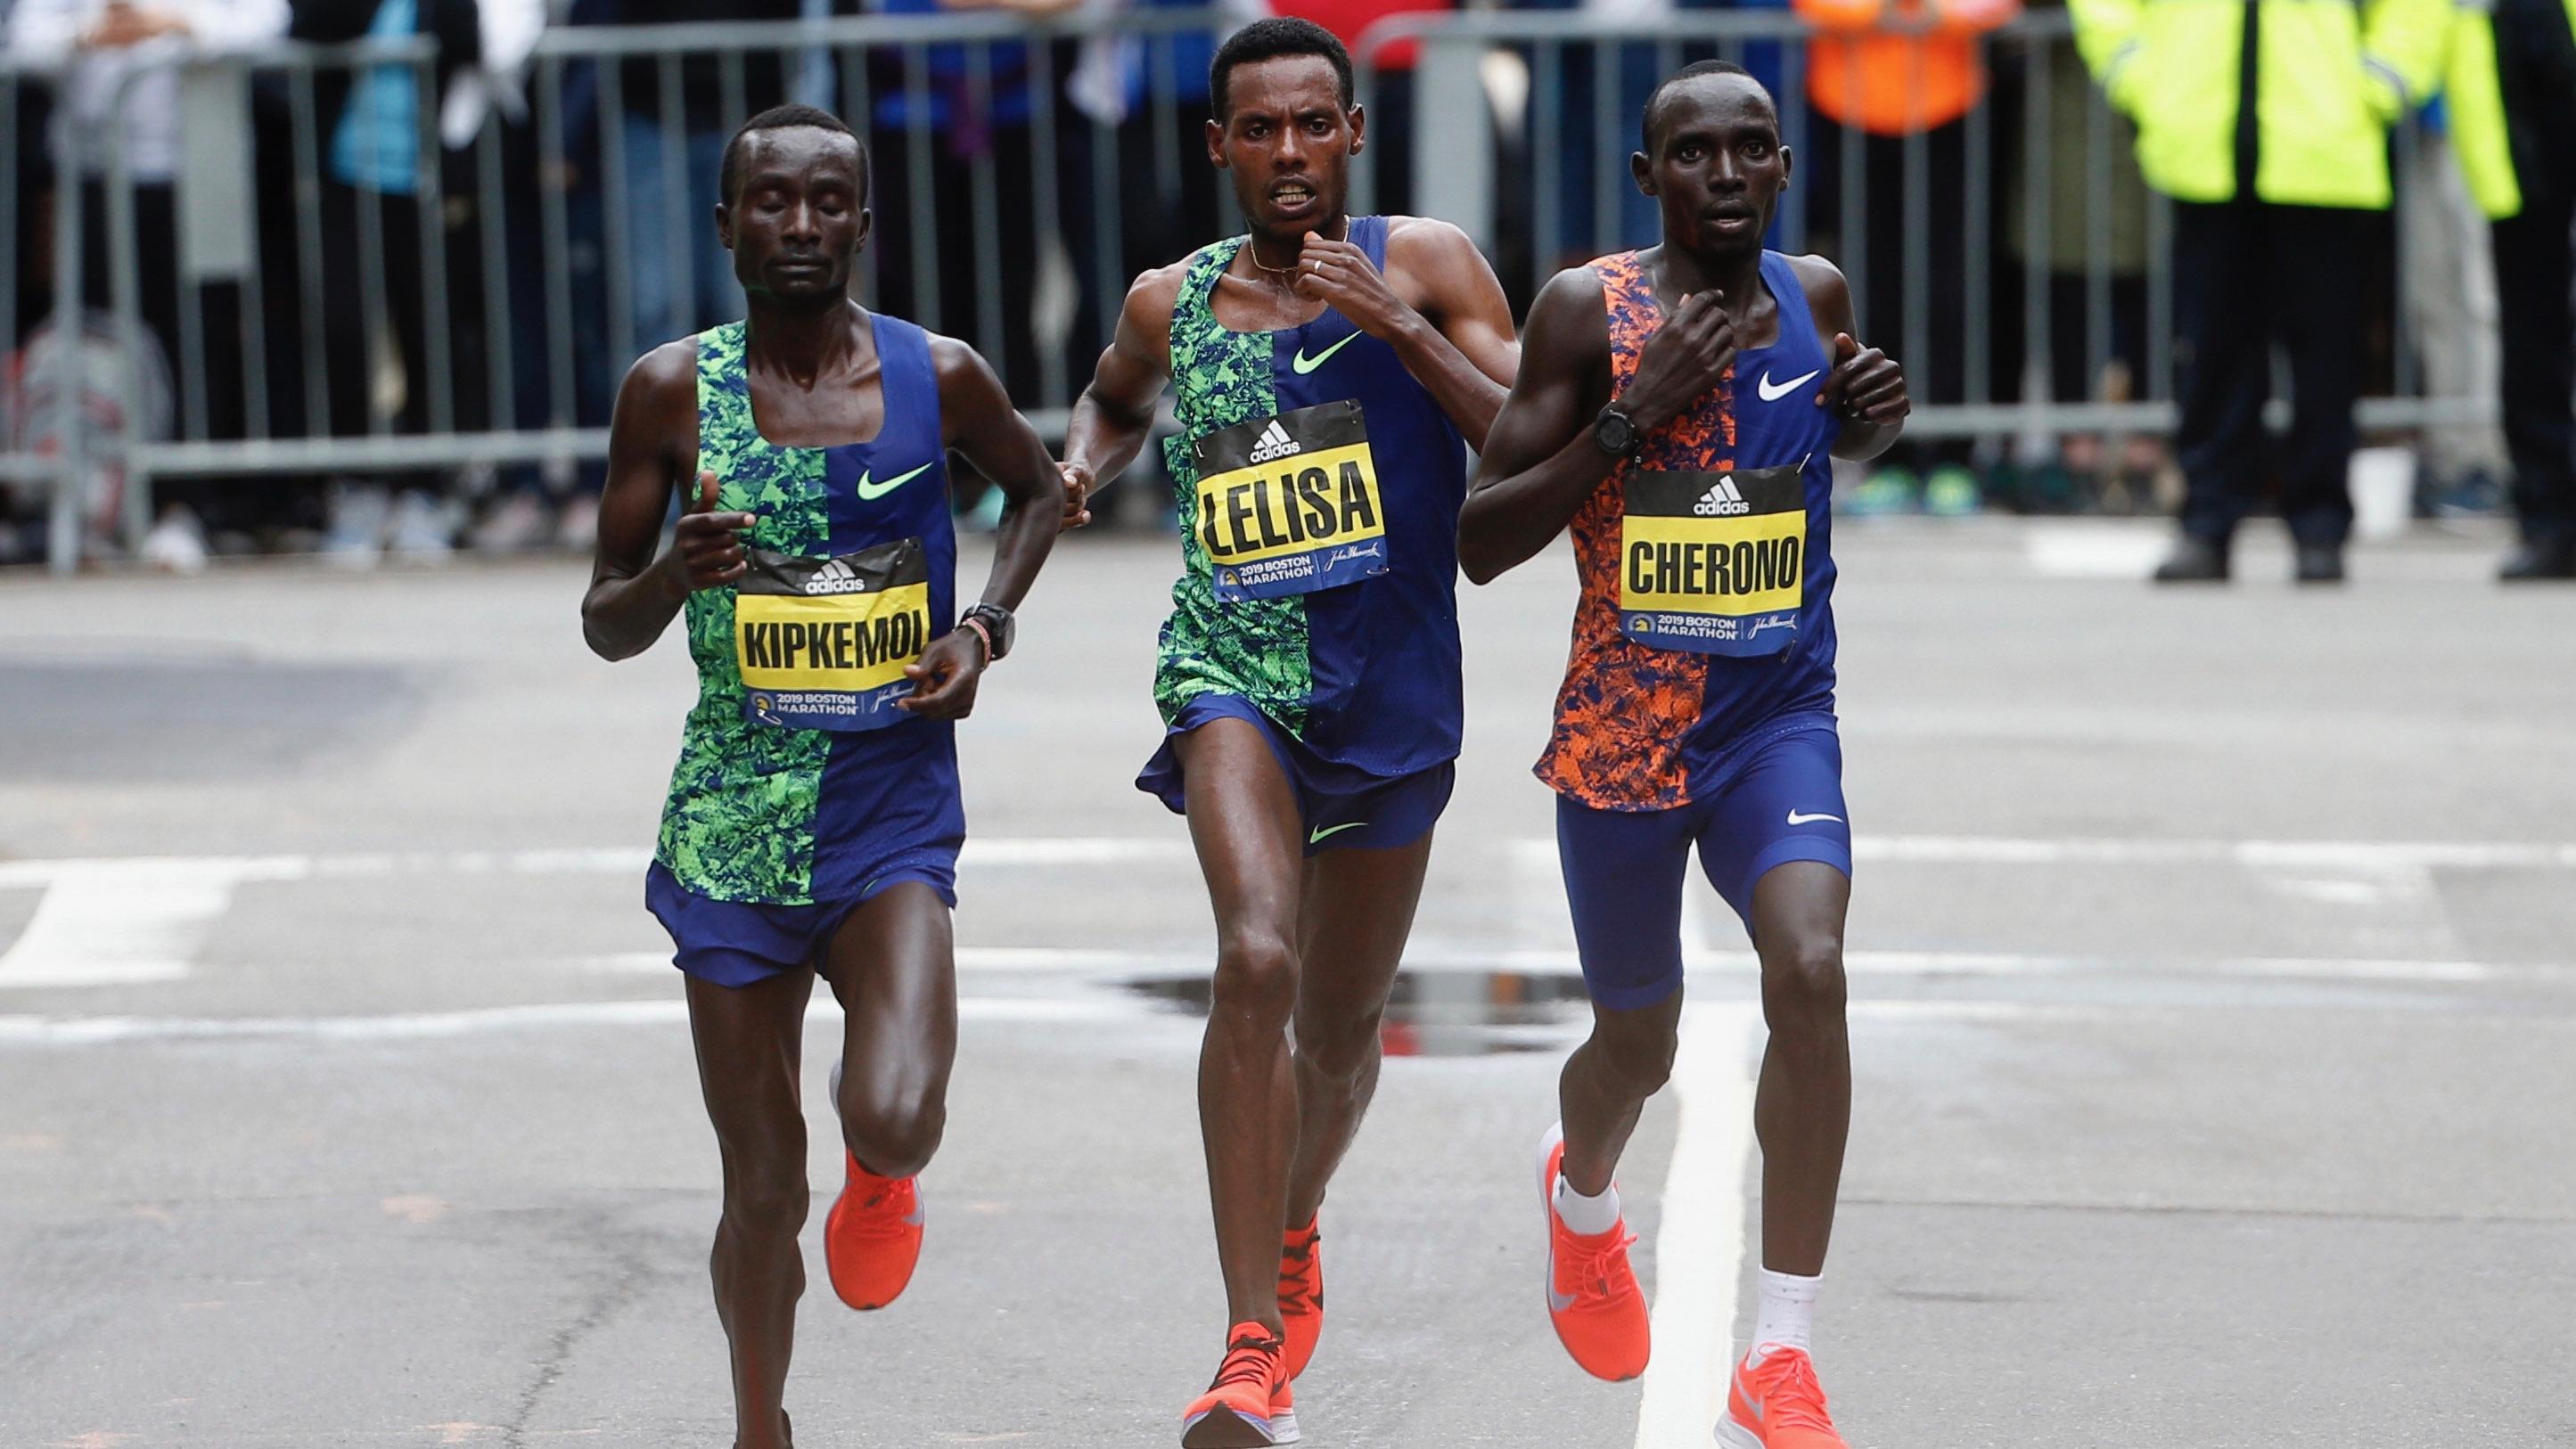 Kenneth Kipkemoi, Lawrence Cherono, and Lelisa Desisa racing to the finish during the 2019 Boston Marathon.